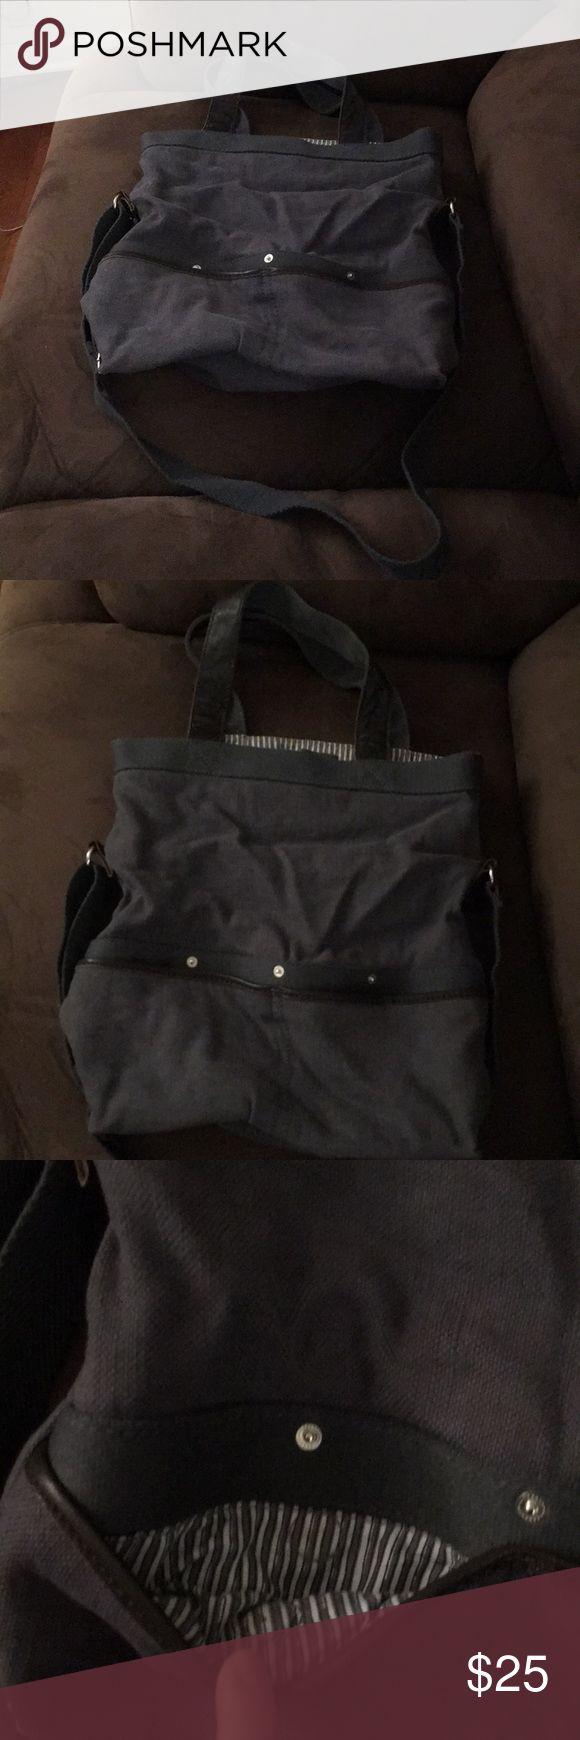 "Gap 15"" x 13"" denim bag multiple pockets in good condition. GAP Bags Totes"